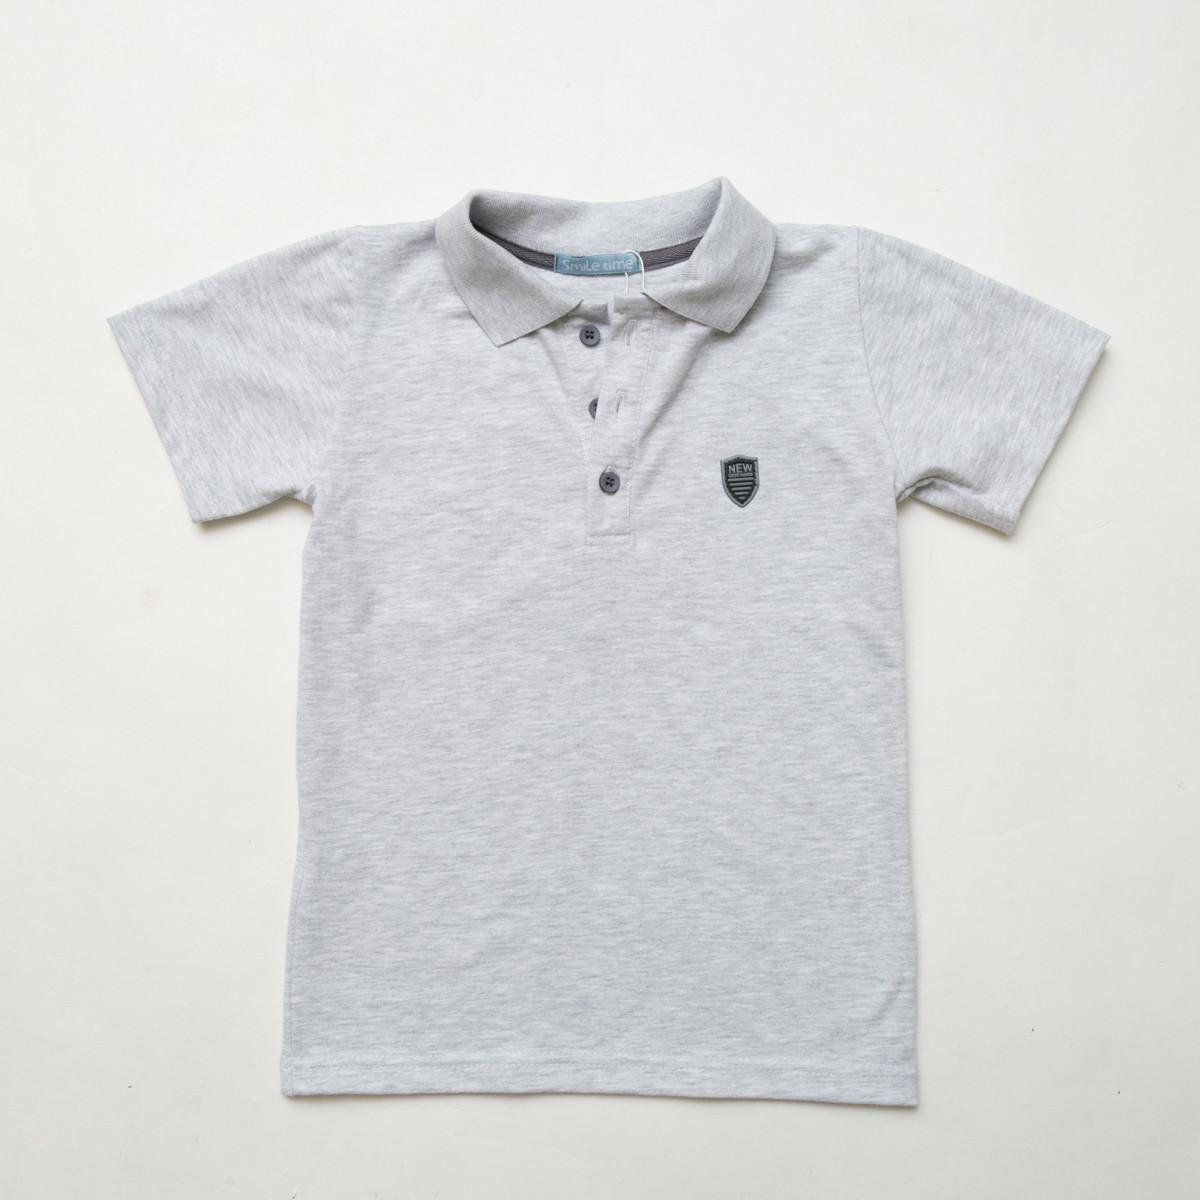 Тенниска для мальчика р.128,134,140 Classic SmileTme , светло-серый